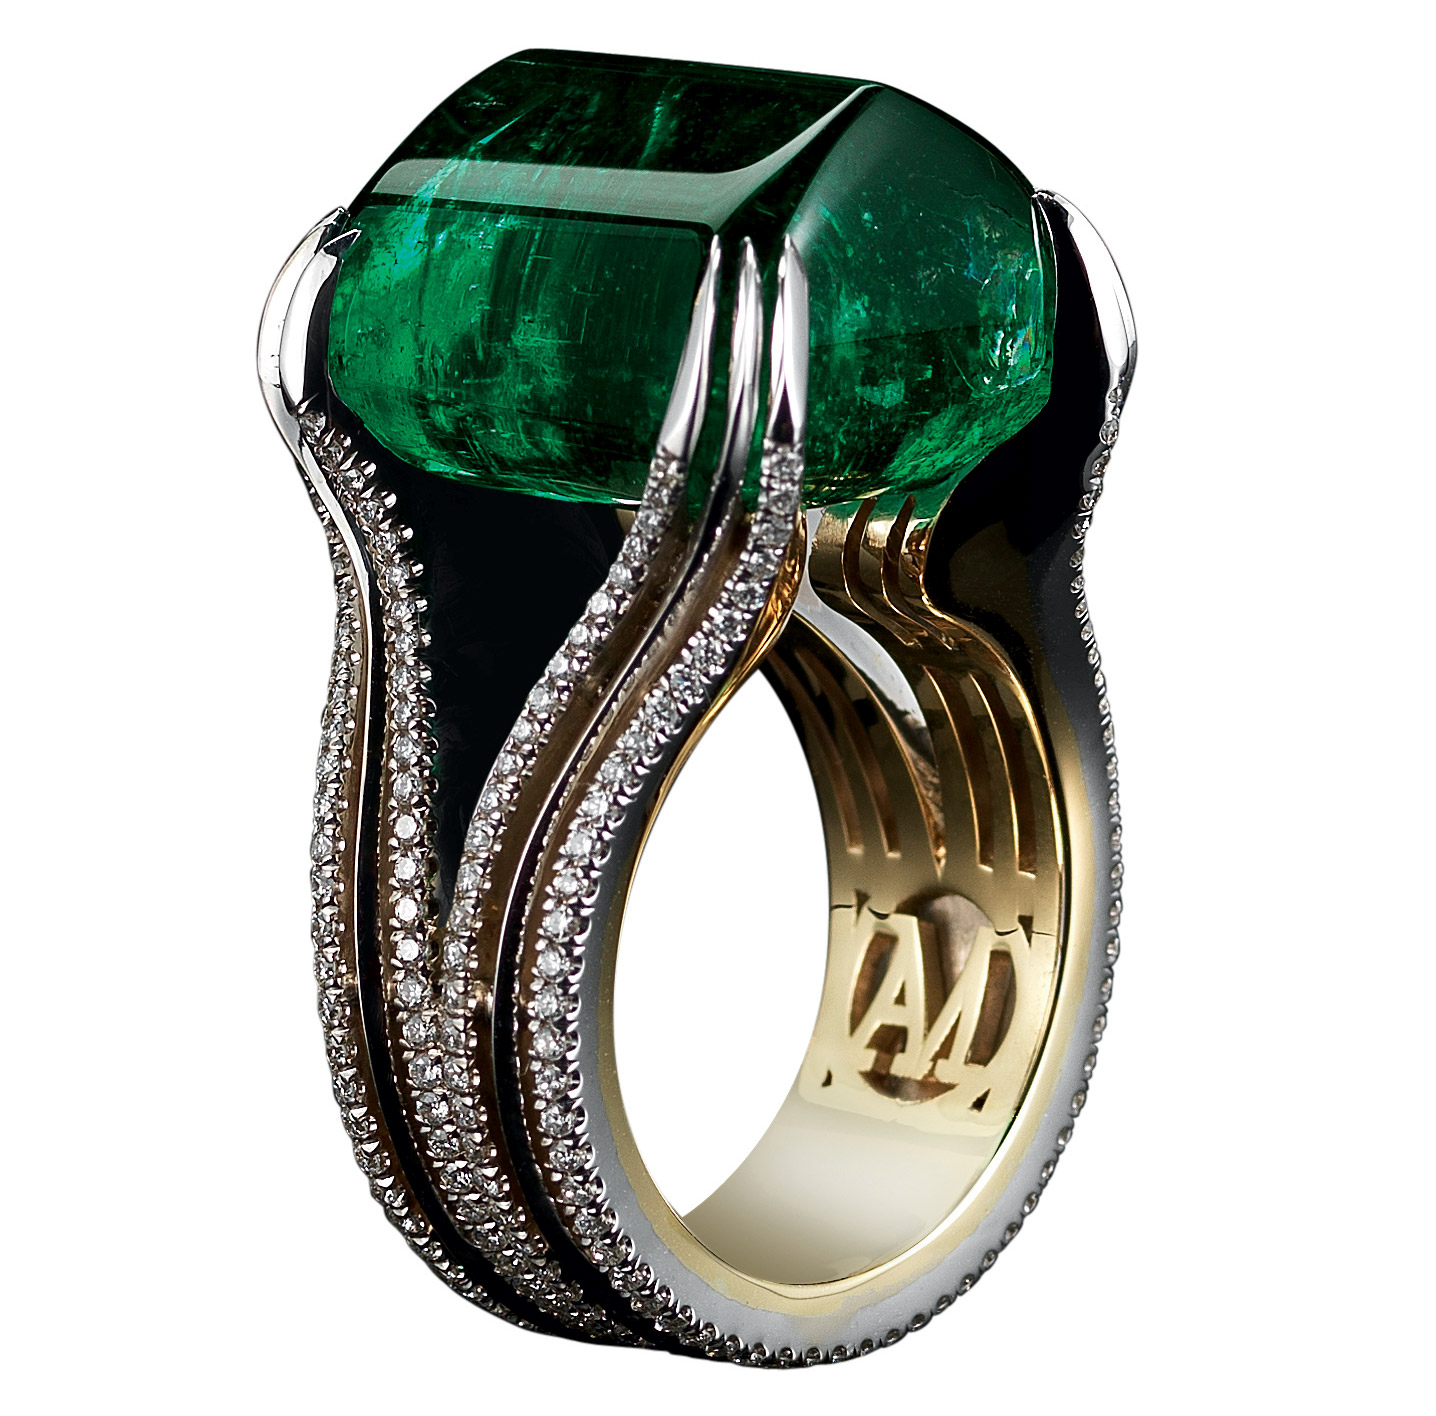 Alexandra Mor's Sugarloaf Cab Emerald & Diamond Ring